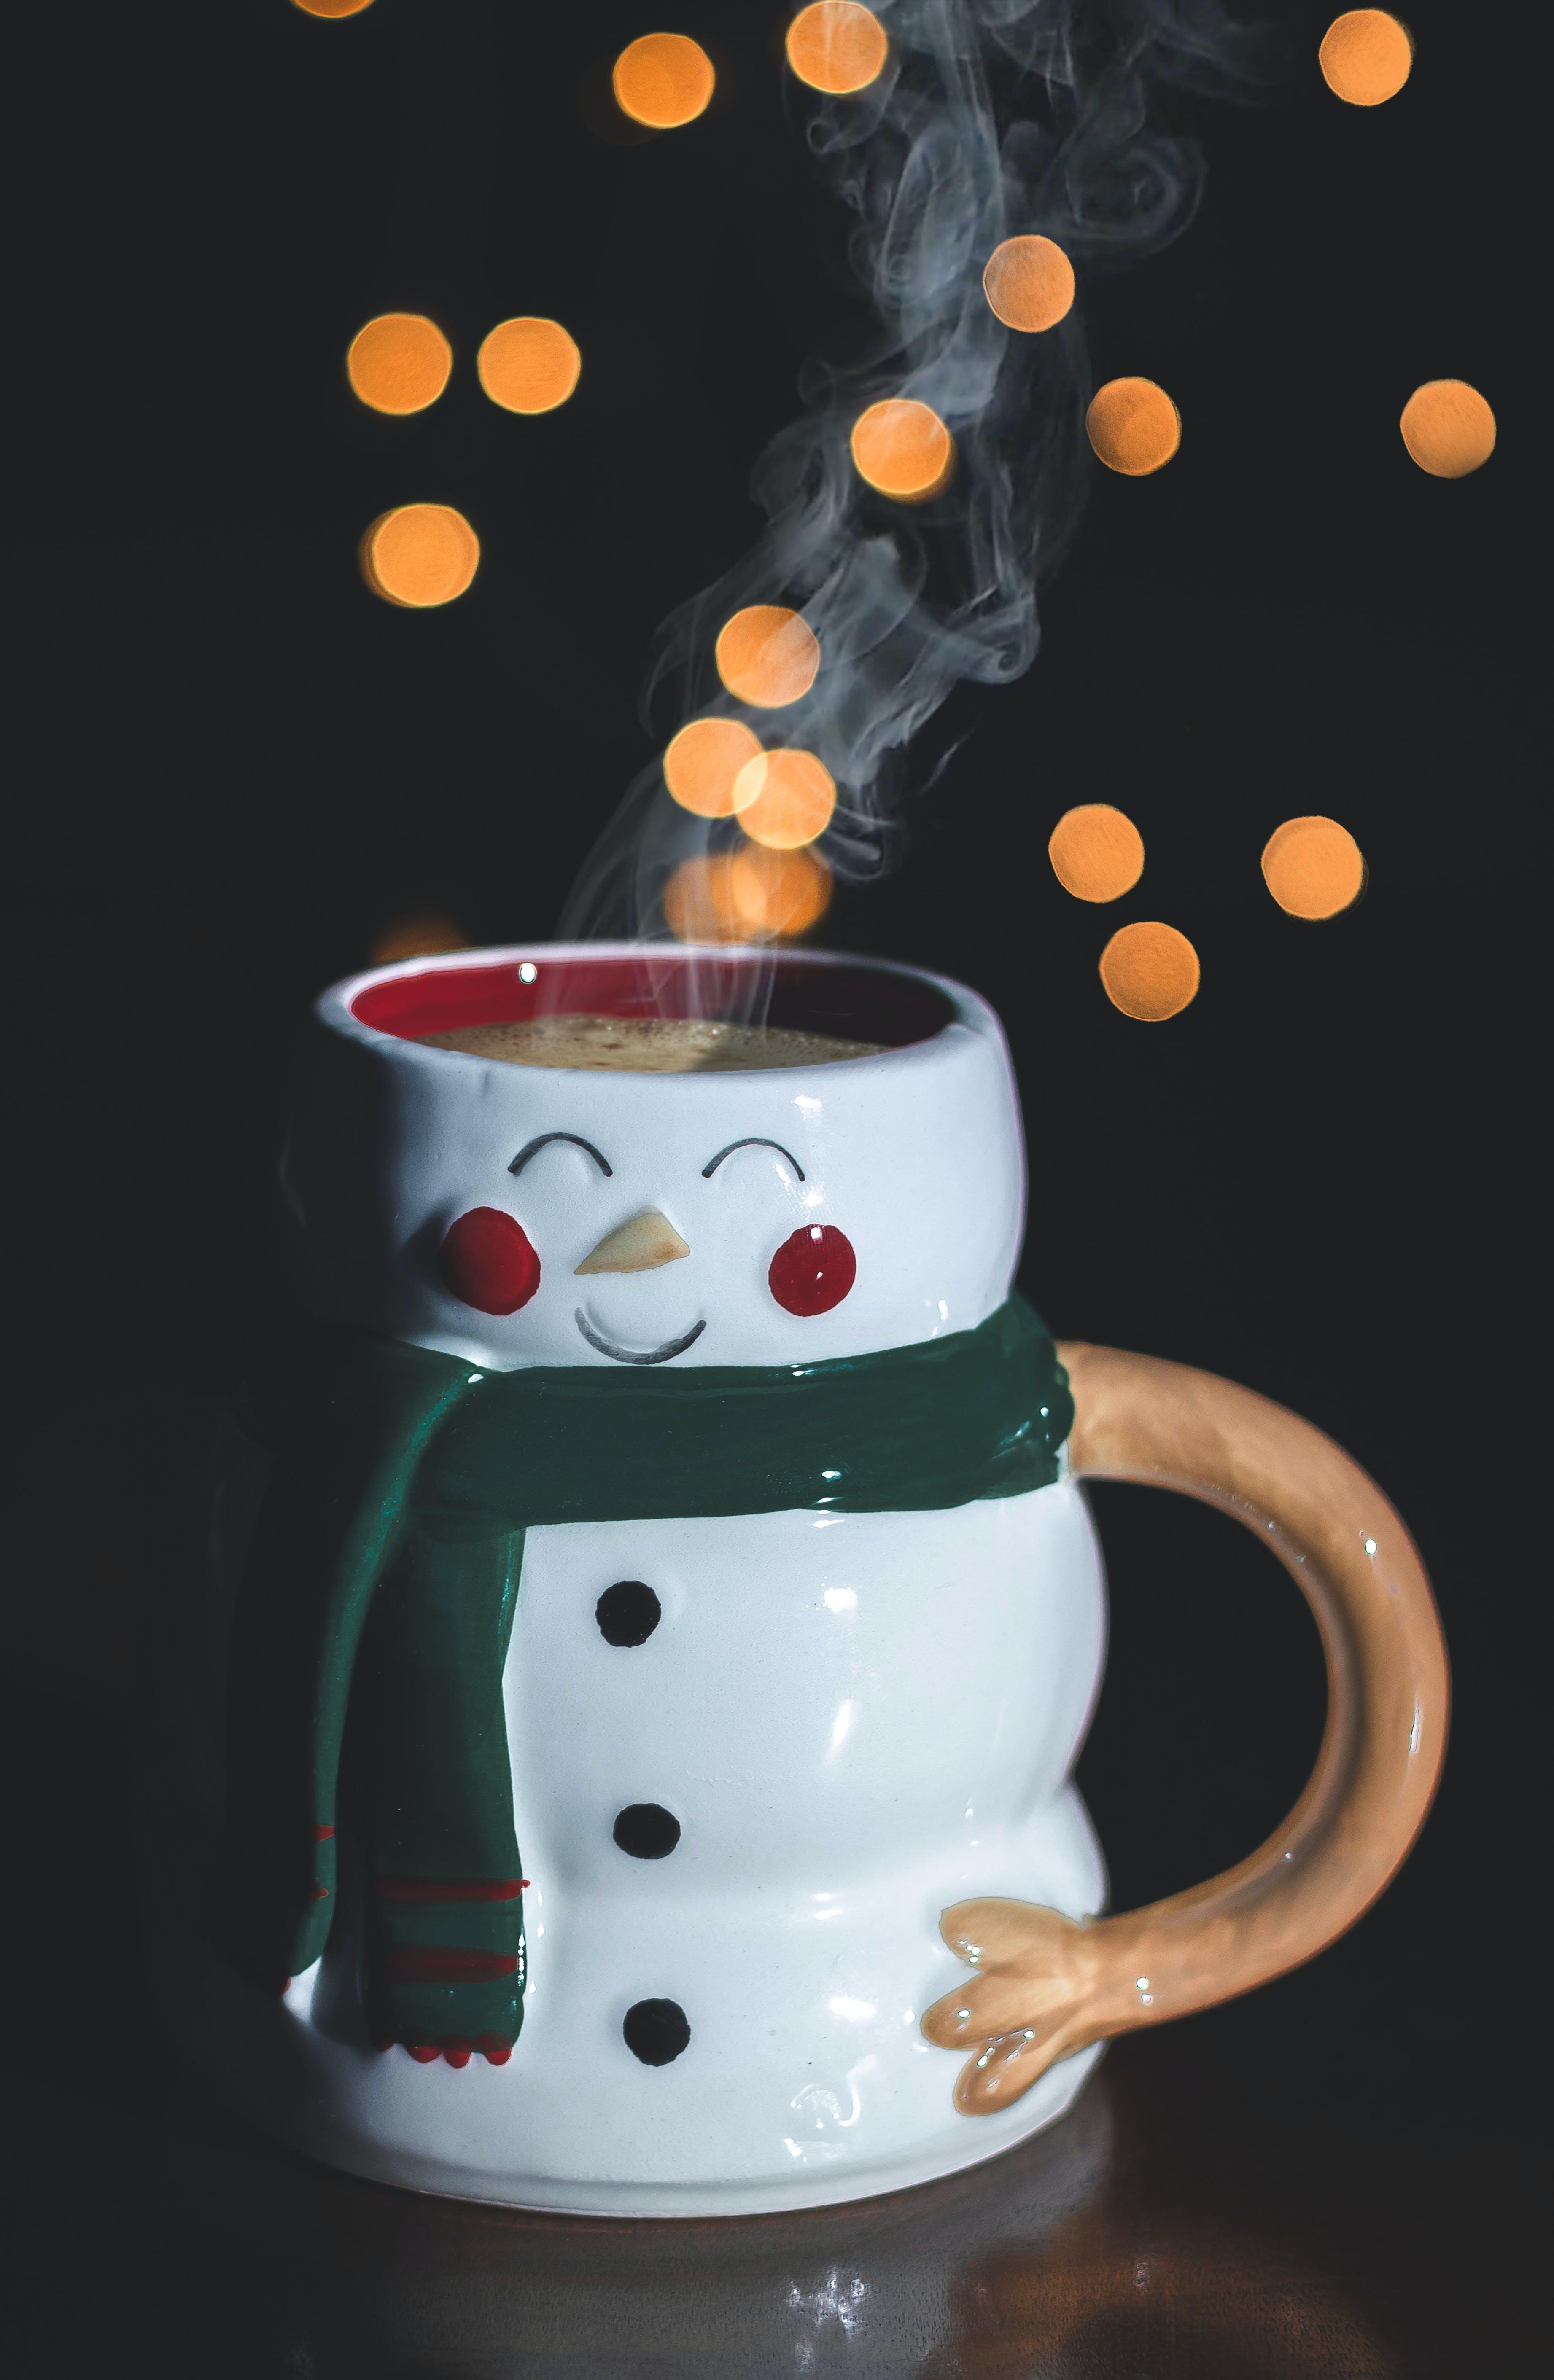 Free stock photo of black background, coffee, mug, snowman